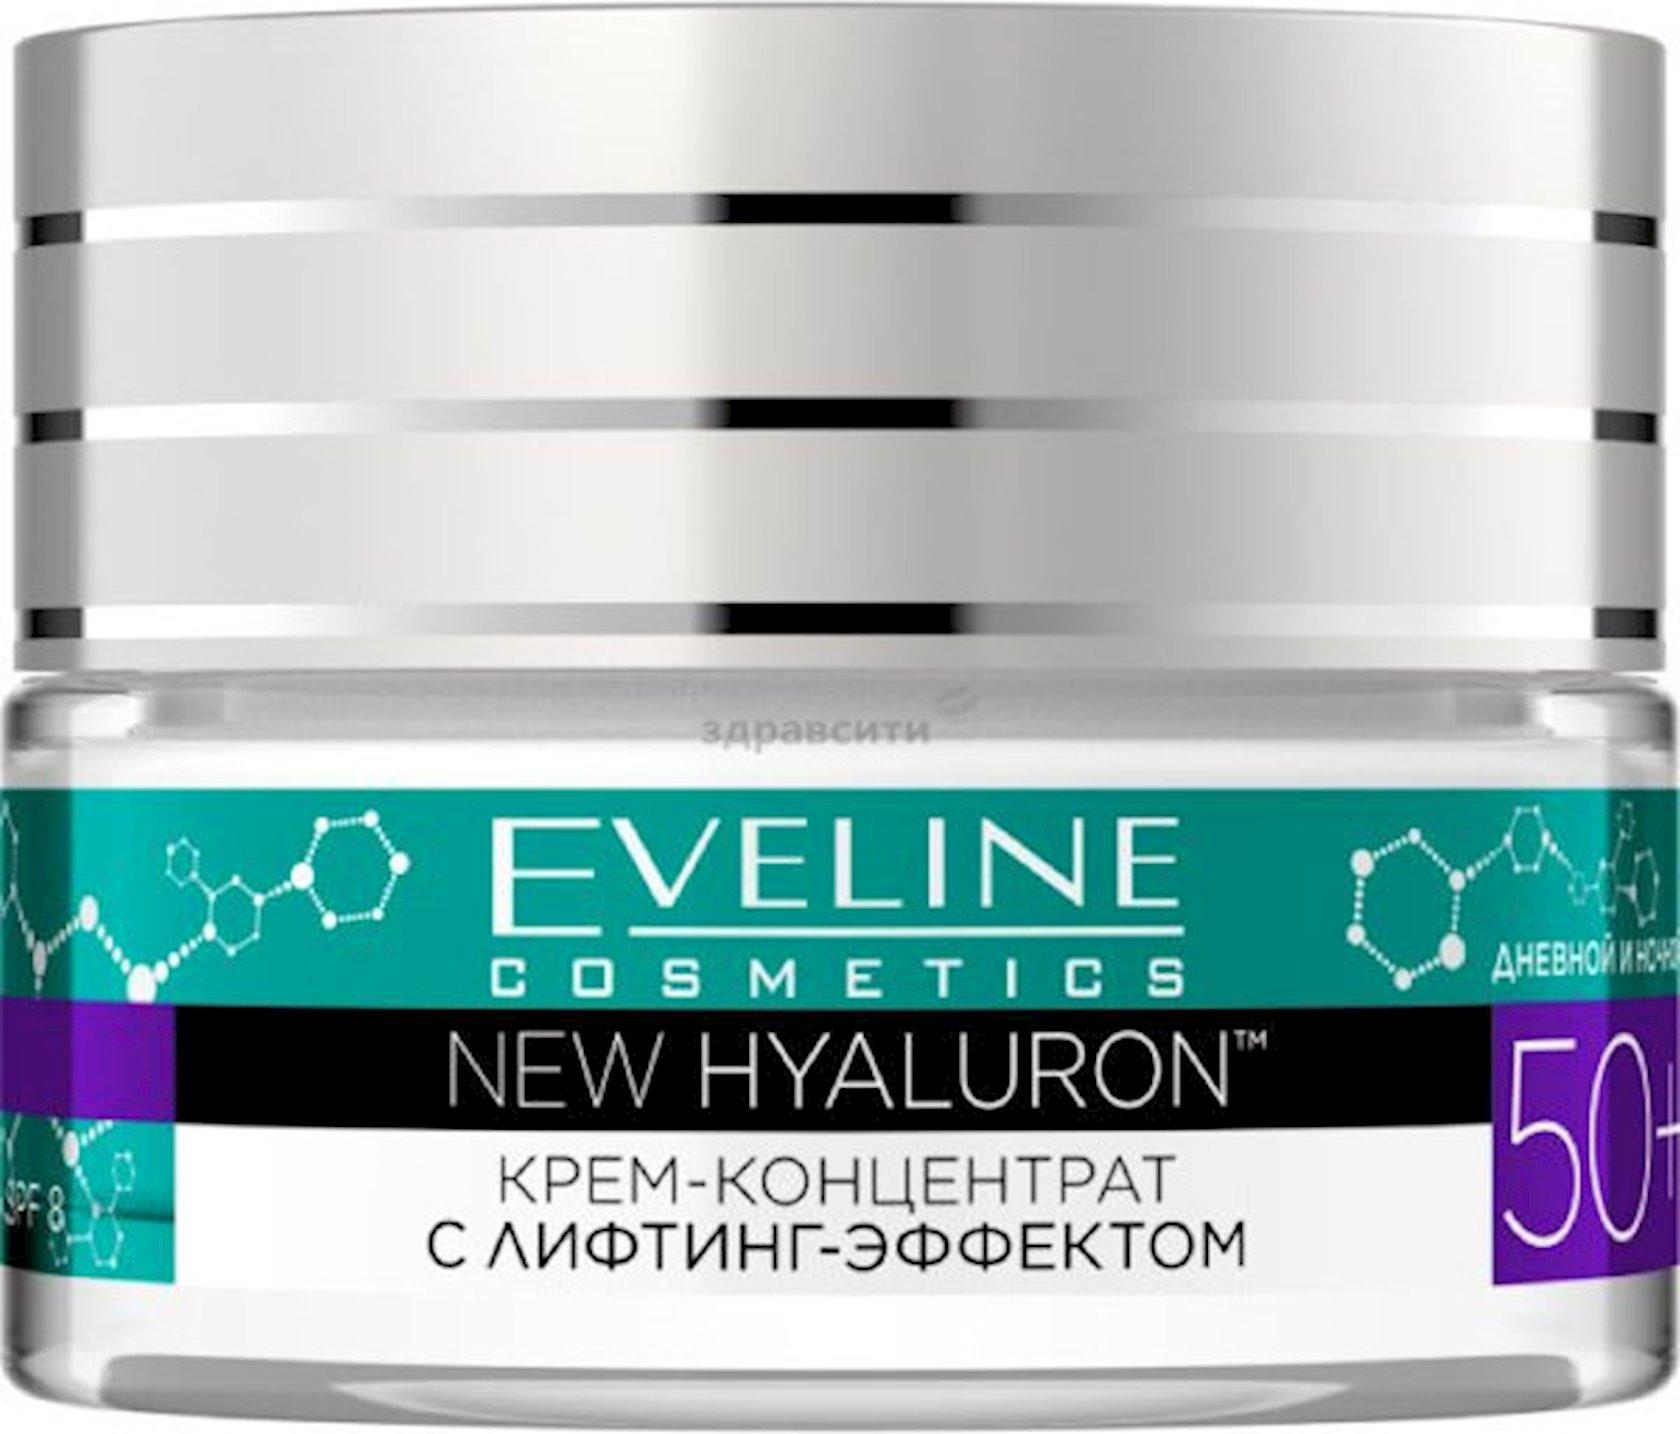 Krem-konsentrant  Eveline Cosmetics 4D BioHyaluron Day/Night 50+